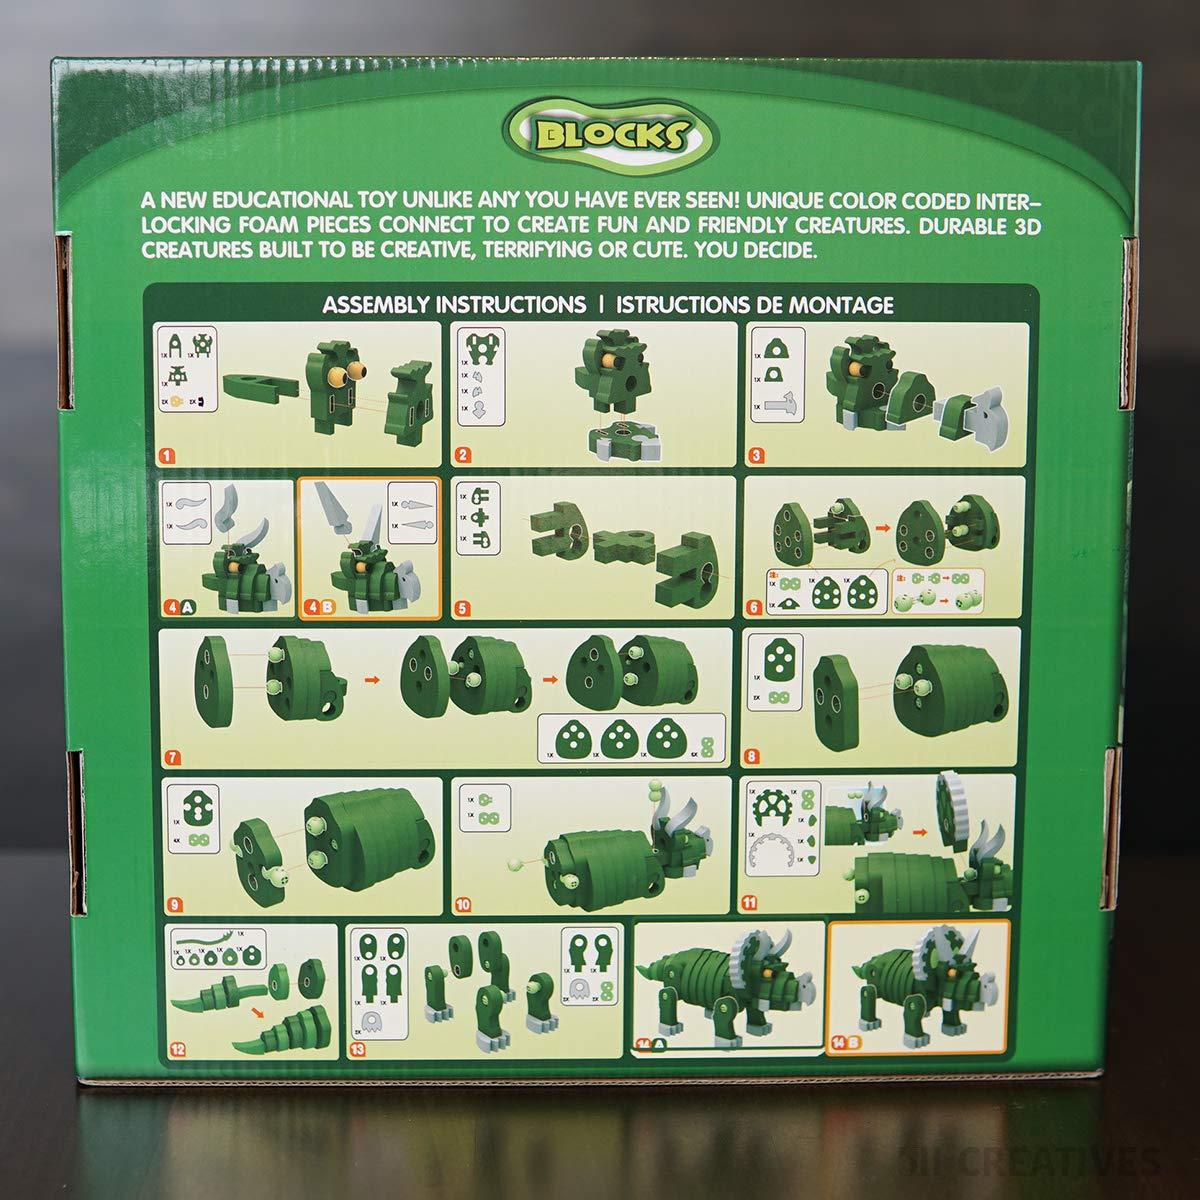 Educational Toys for Children 511 Creatives Original 3D Interlocking Foam Puzzles Blocks Triceratops Dinosaur STEM Toys